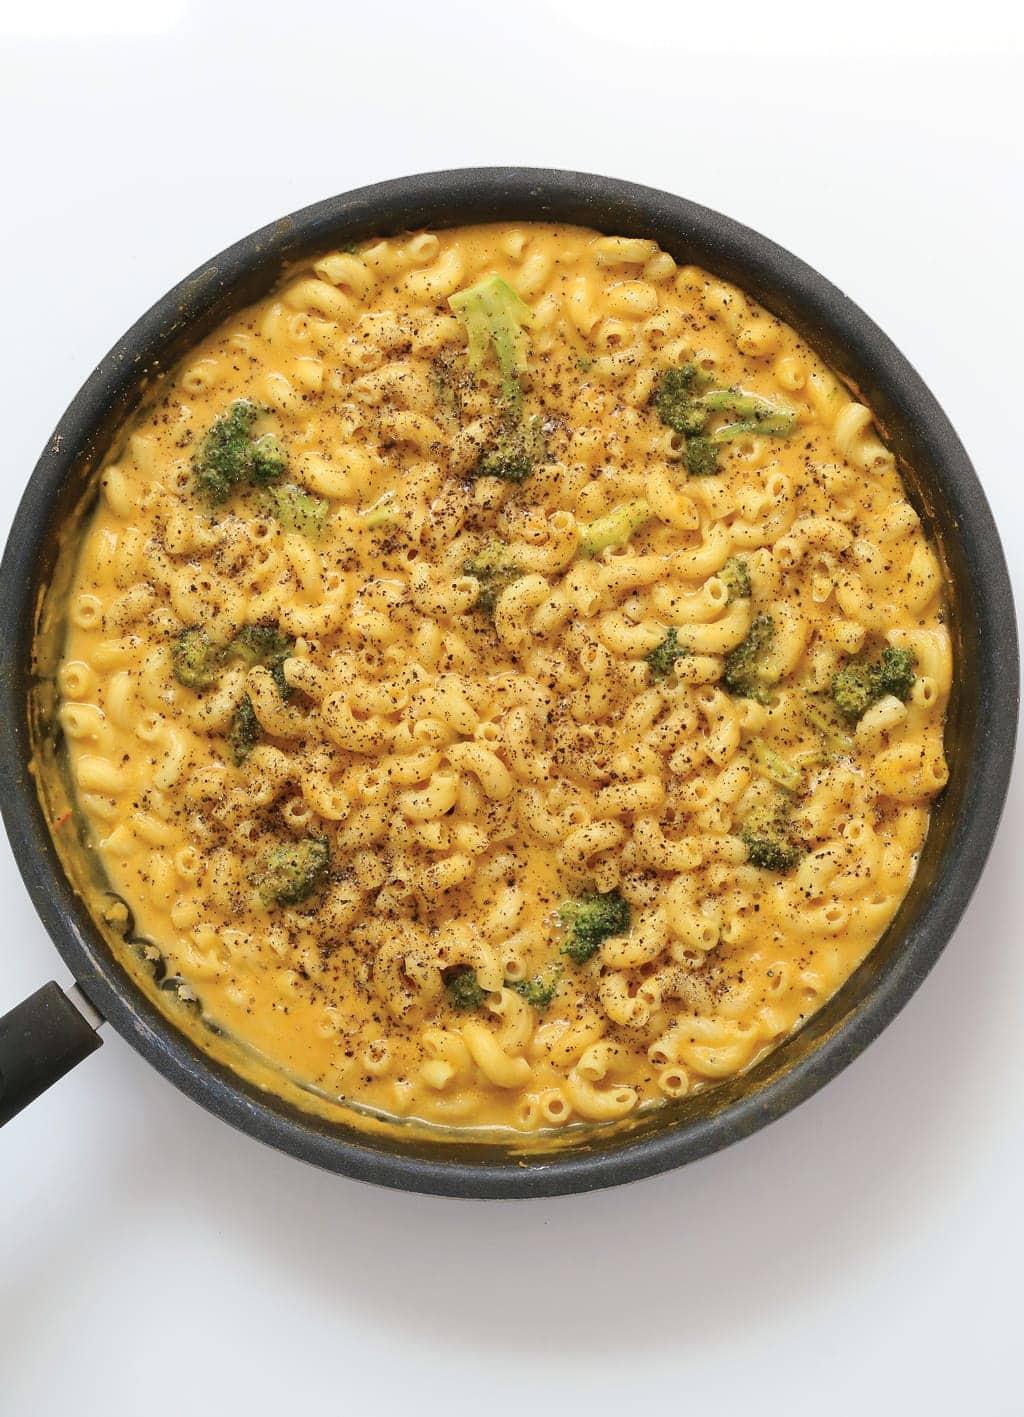 Recipe from Vegan Richa's Everyday Kitchen